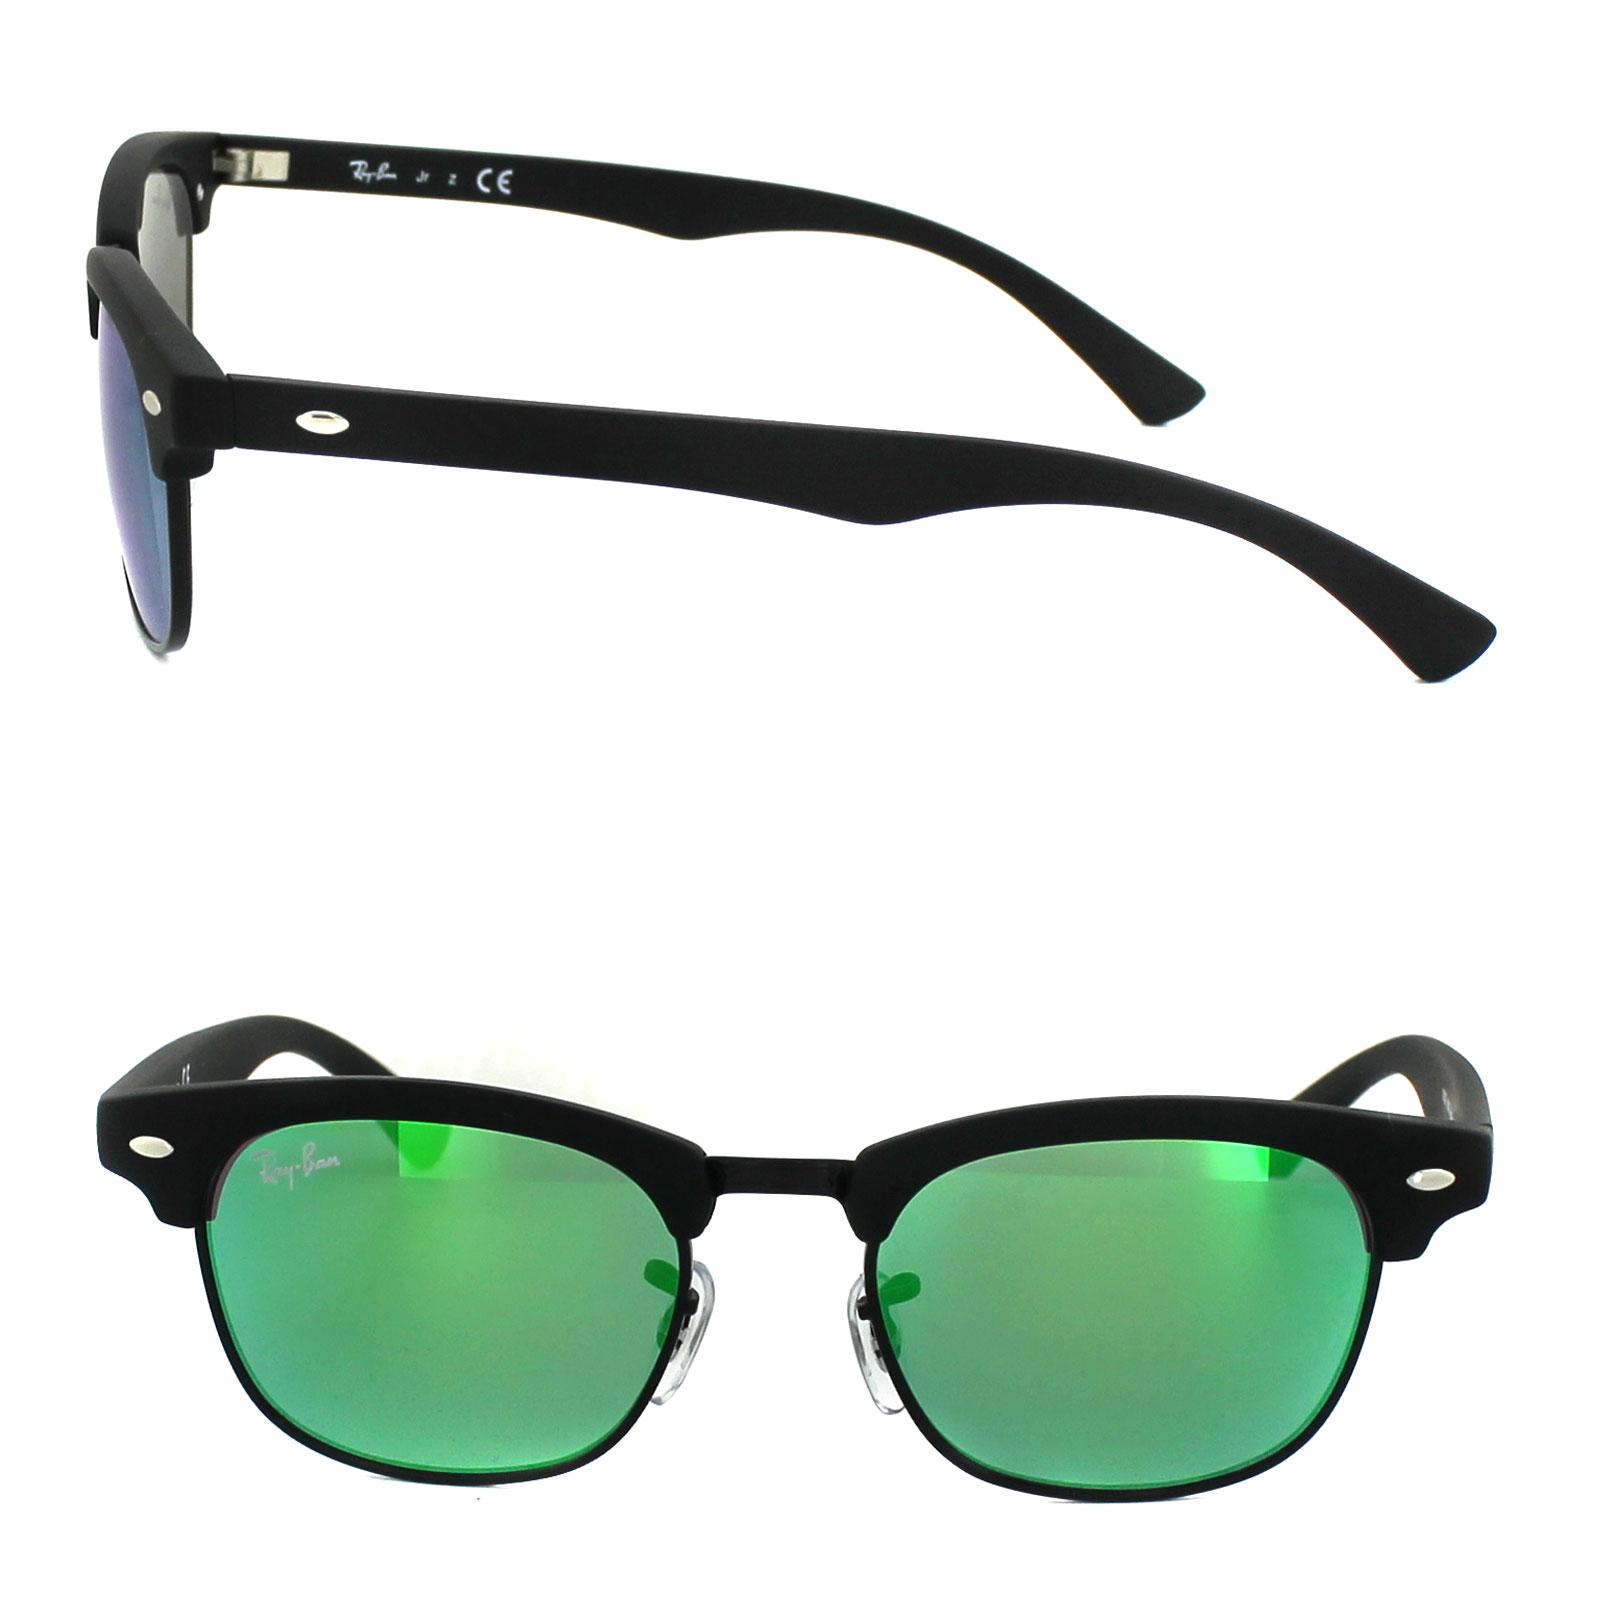 d01673d4fc5 Sentinel Ray-Ban Junior Sunglasses 9050 100S3R Black Green Flash Mirror